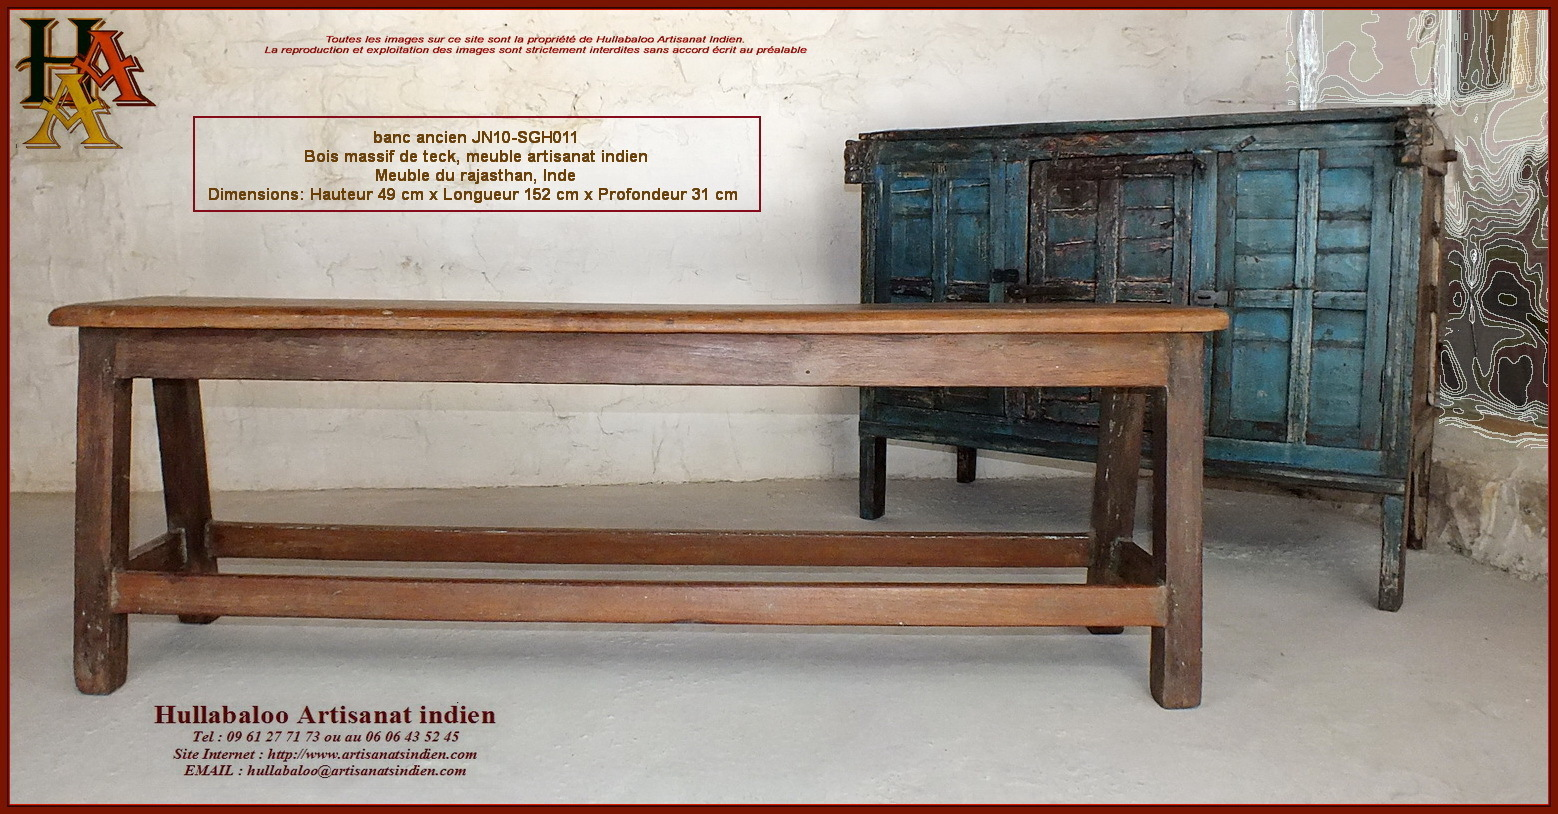 Banc Indien Ancien Jn10 Sgh011 Meubles Indiens Artisanat Dasie